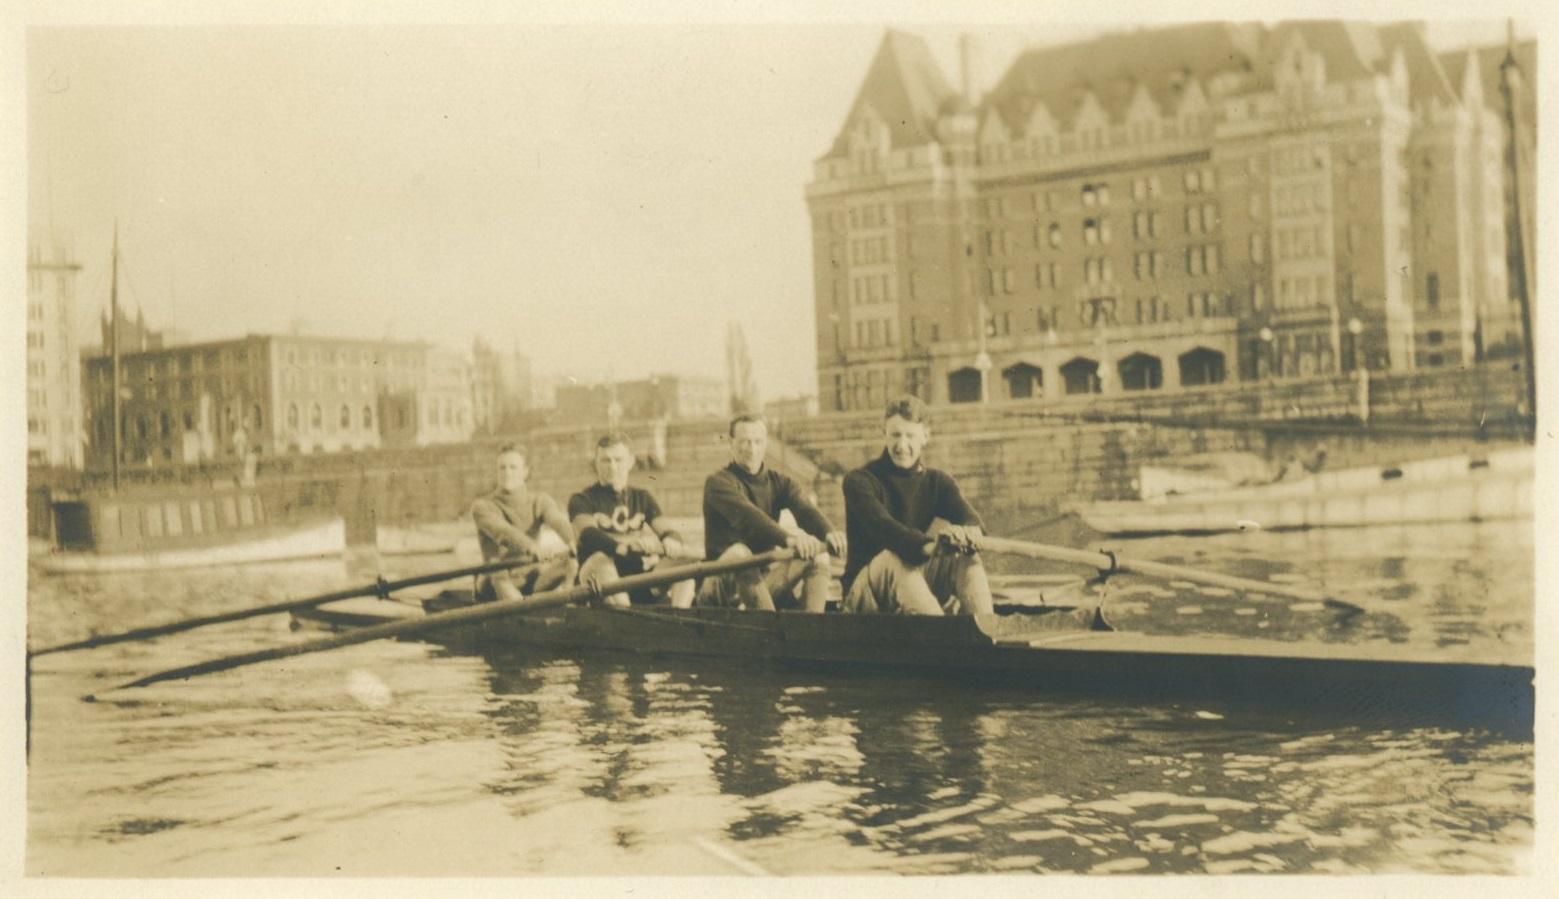 Blayney Scott Rowing